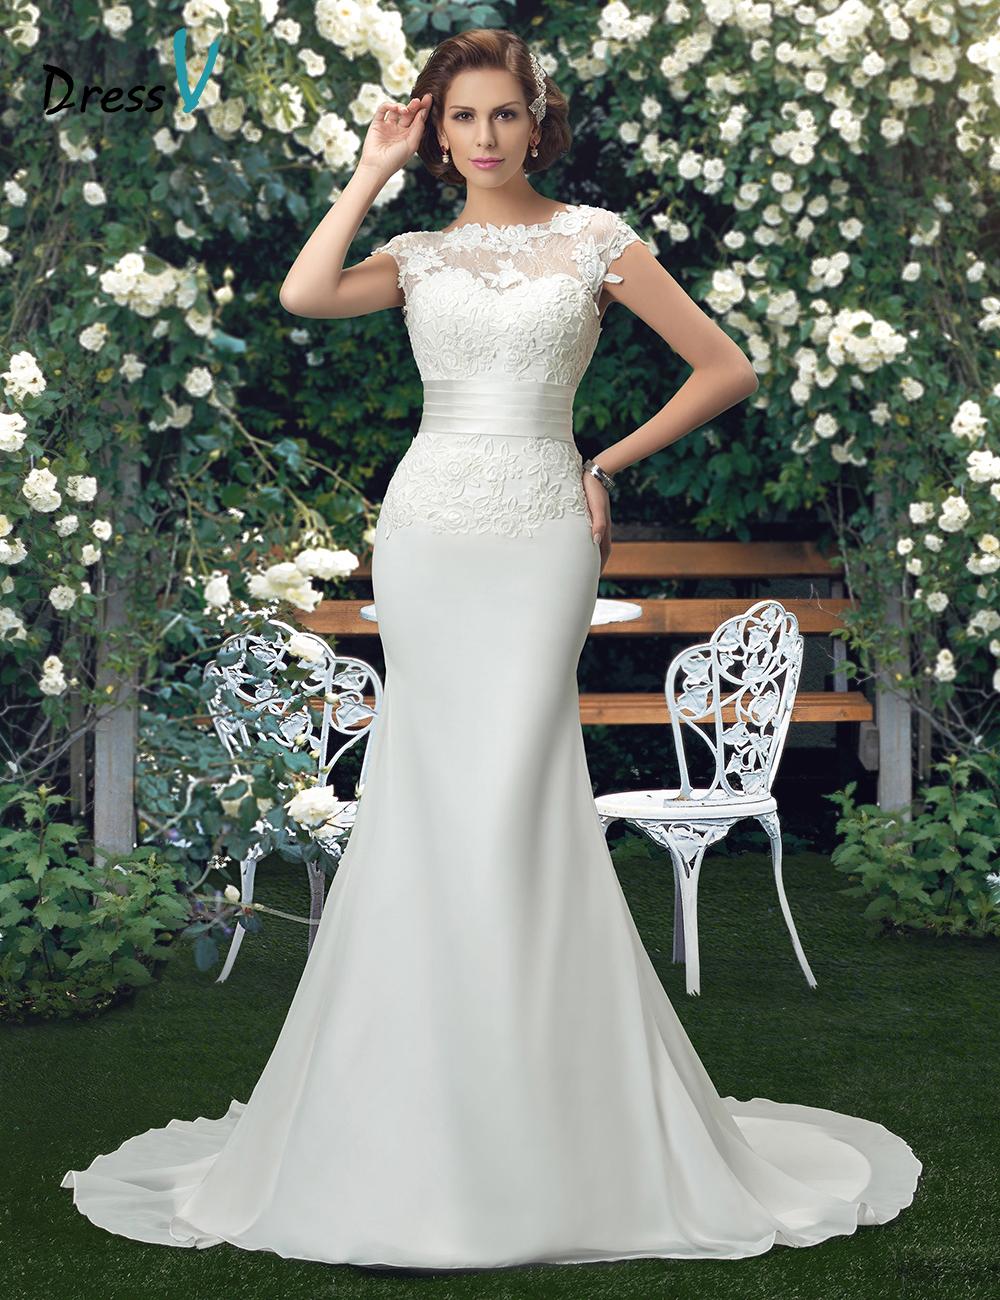 Charming scoop lace wedding dresses 2016 trumpet ivory for Ivory trumpet wedding dress